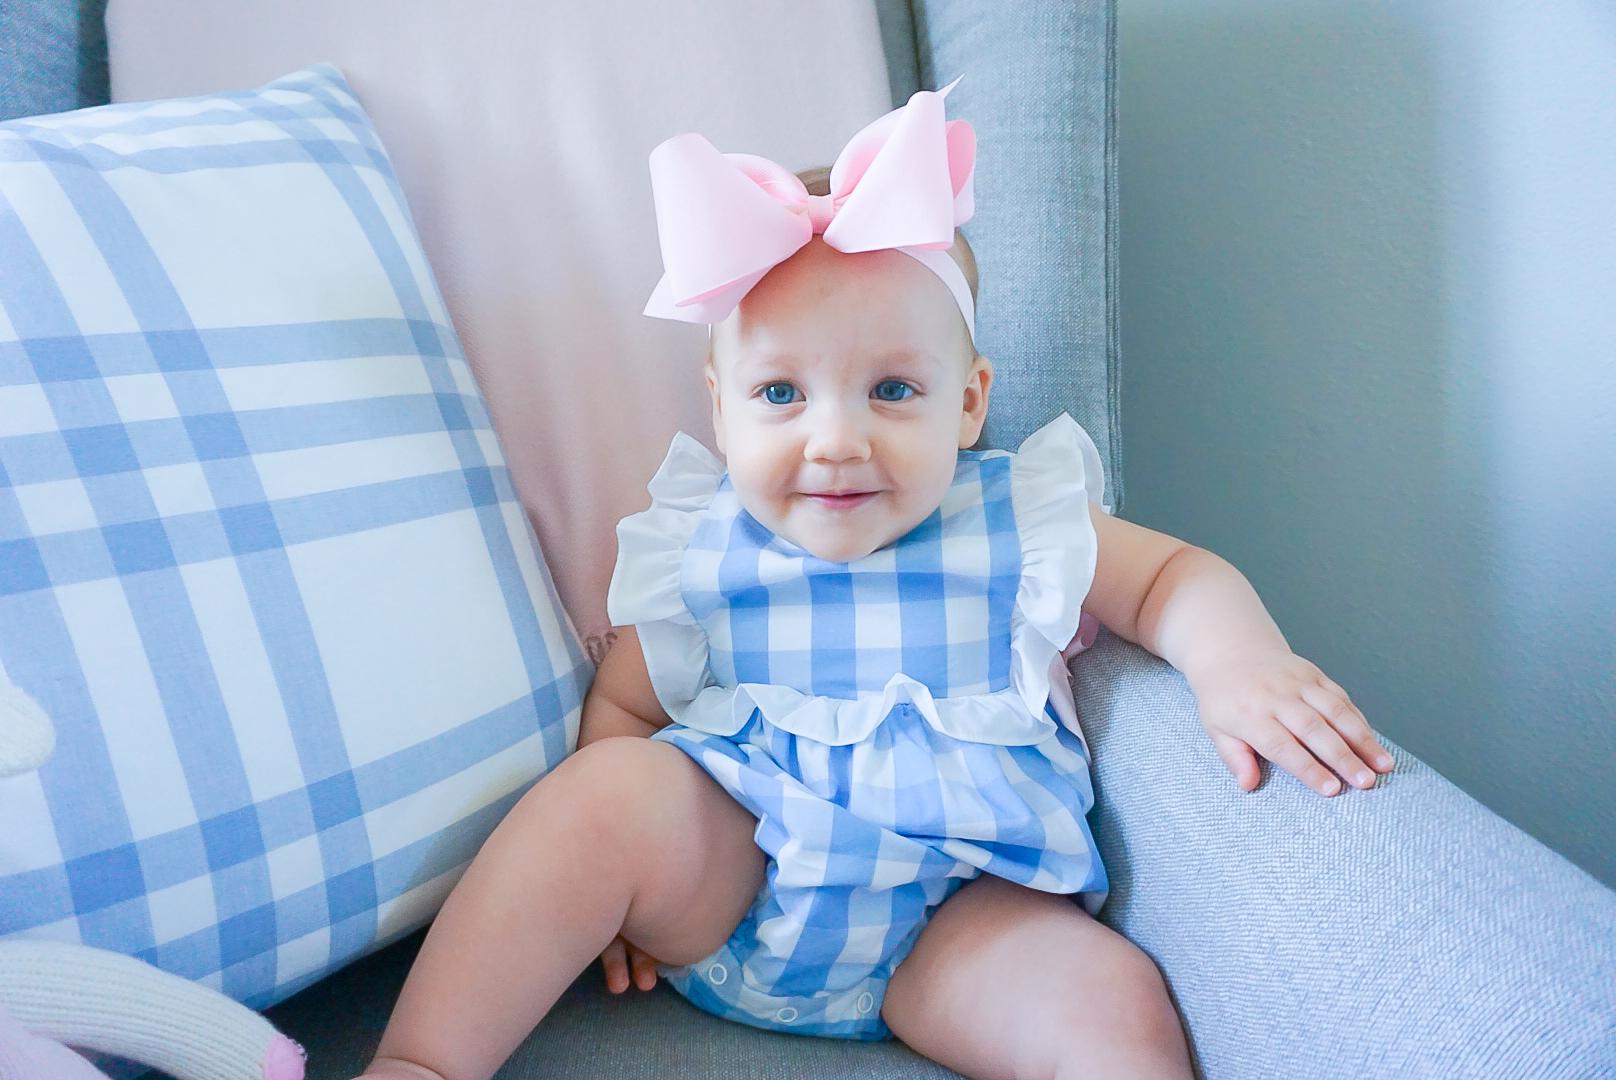 motherhood blog, 12 month old baby blog, baby led weaning blog 2020